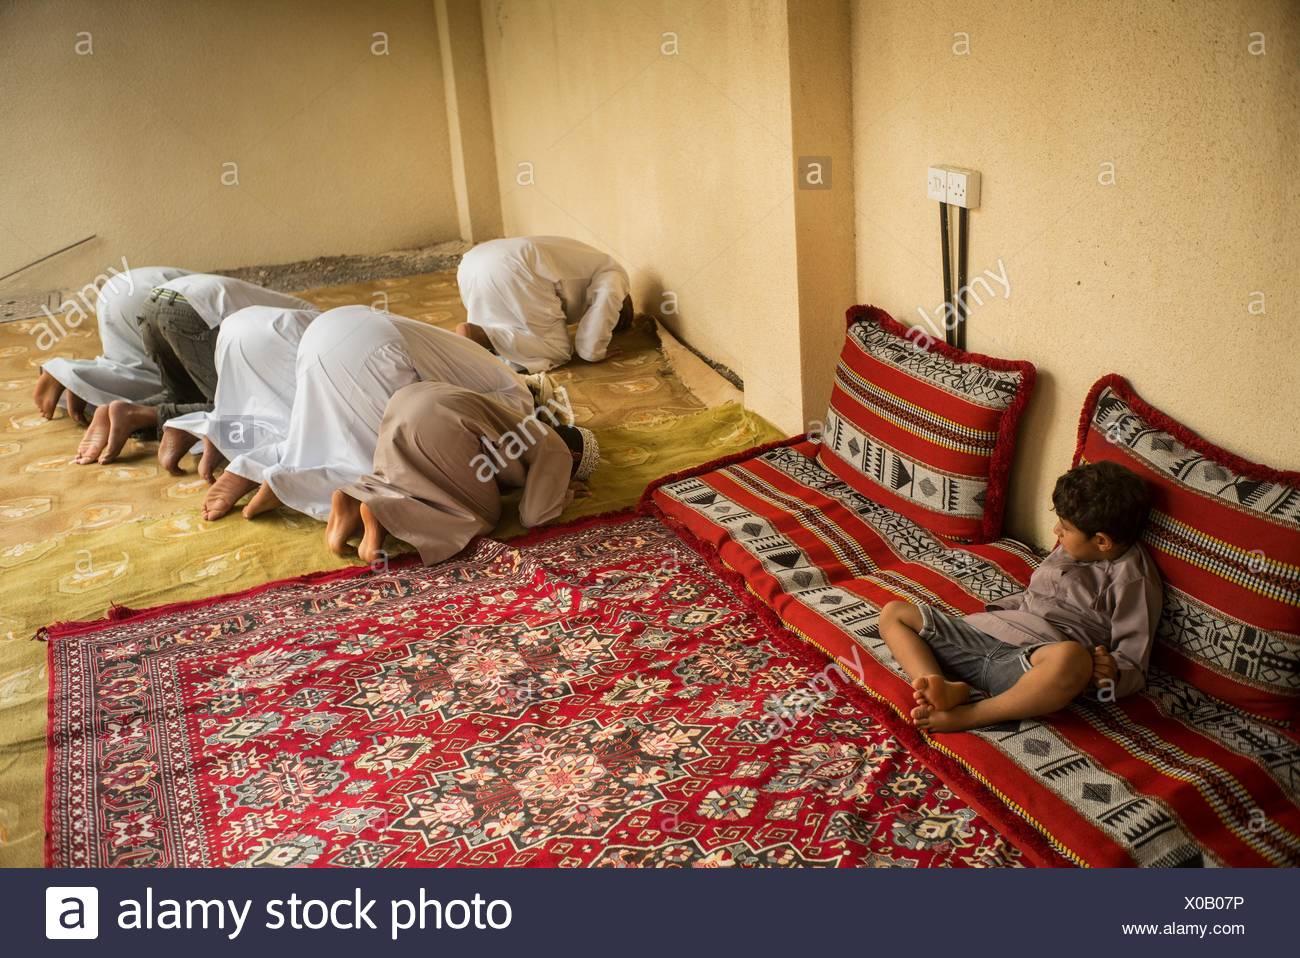 A boy watches his Muslim relatives praying. - Stock Image